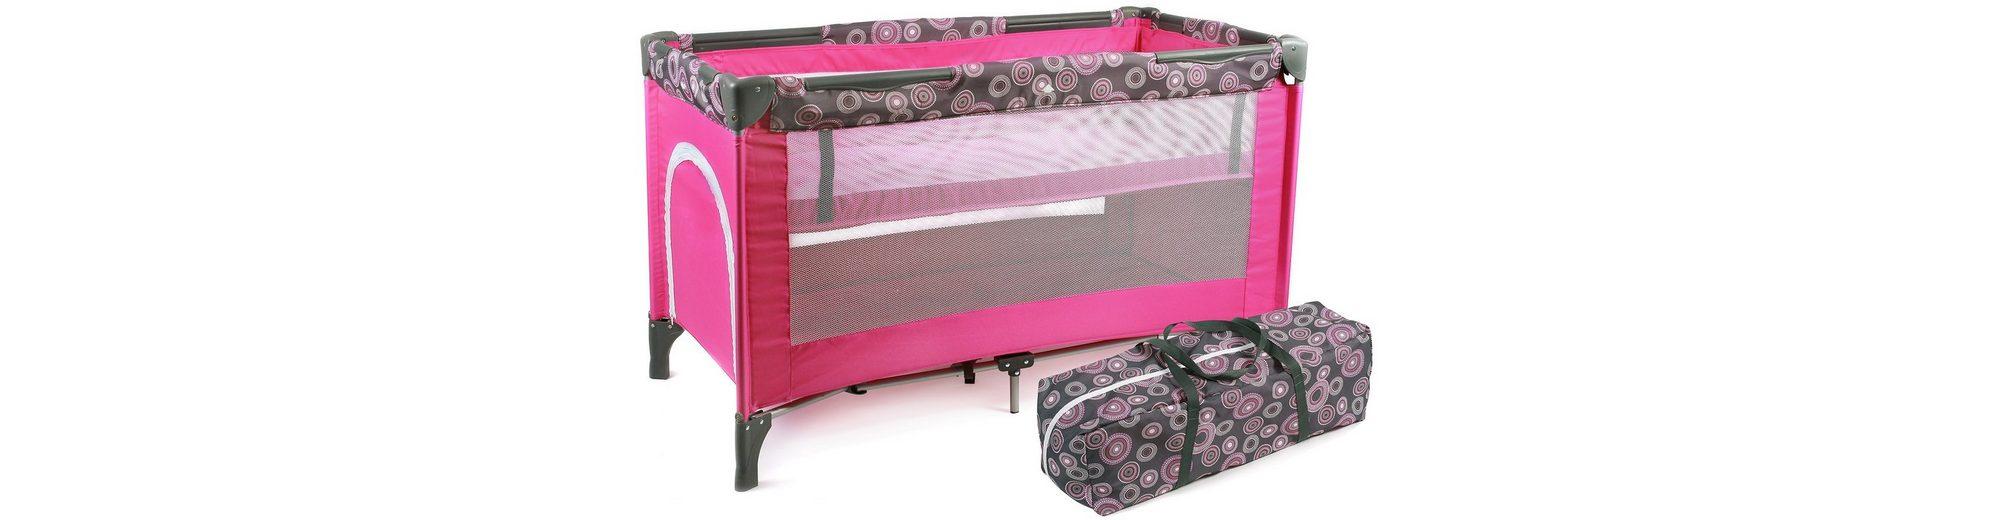 CHIC4BABY Reisebett, »Luxus, hot pink«